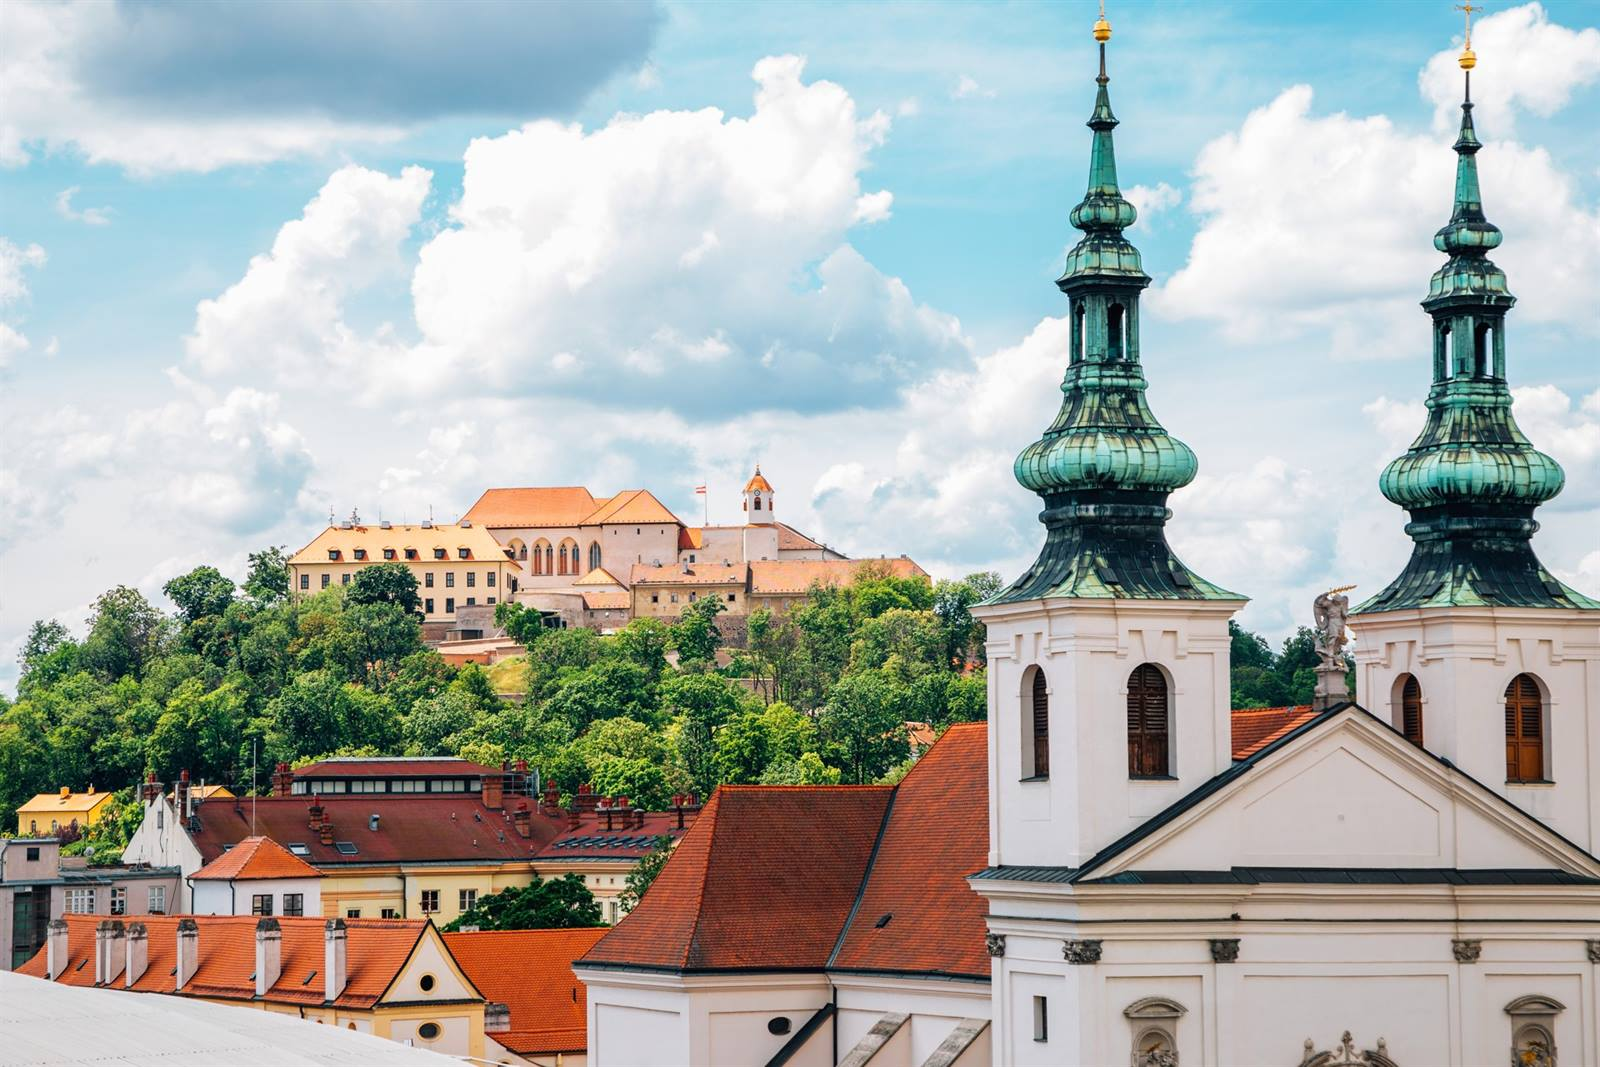 Dé 15 x mooiste bezienswaardigheden in Brno + omgeving